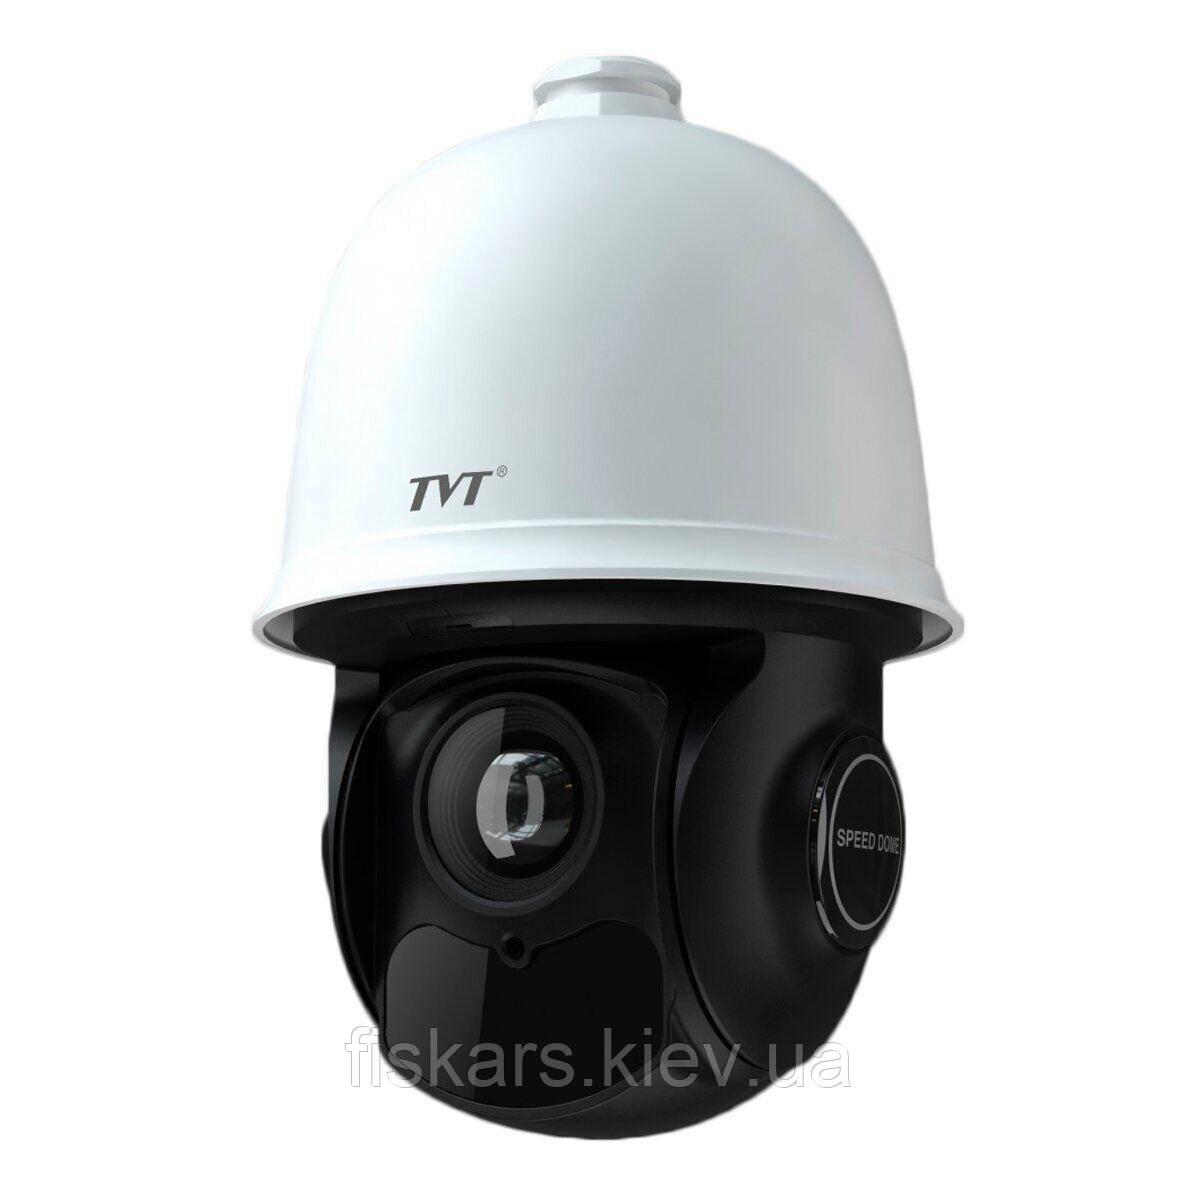 3 Мп Speed Dome IP видеокамера TVT Digital TD-9632E2